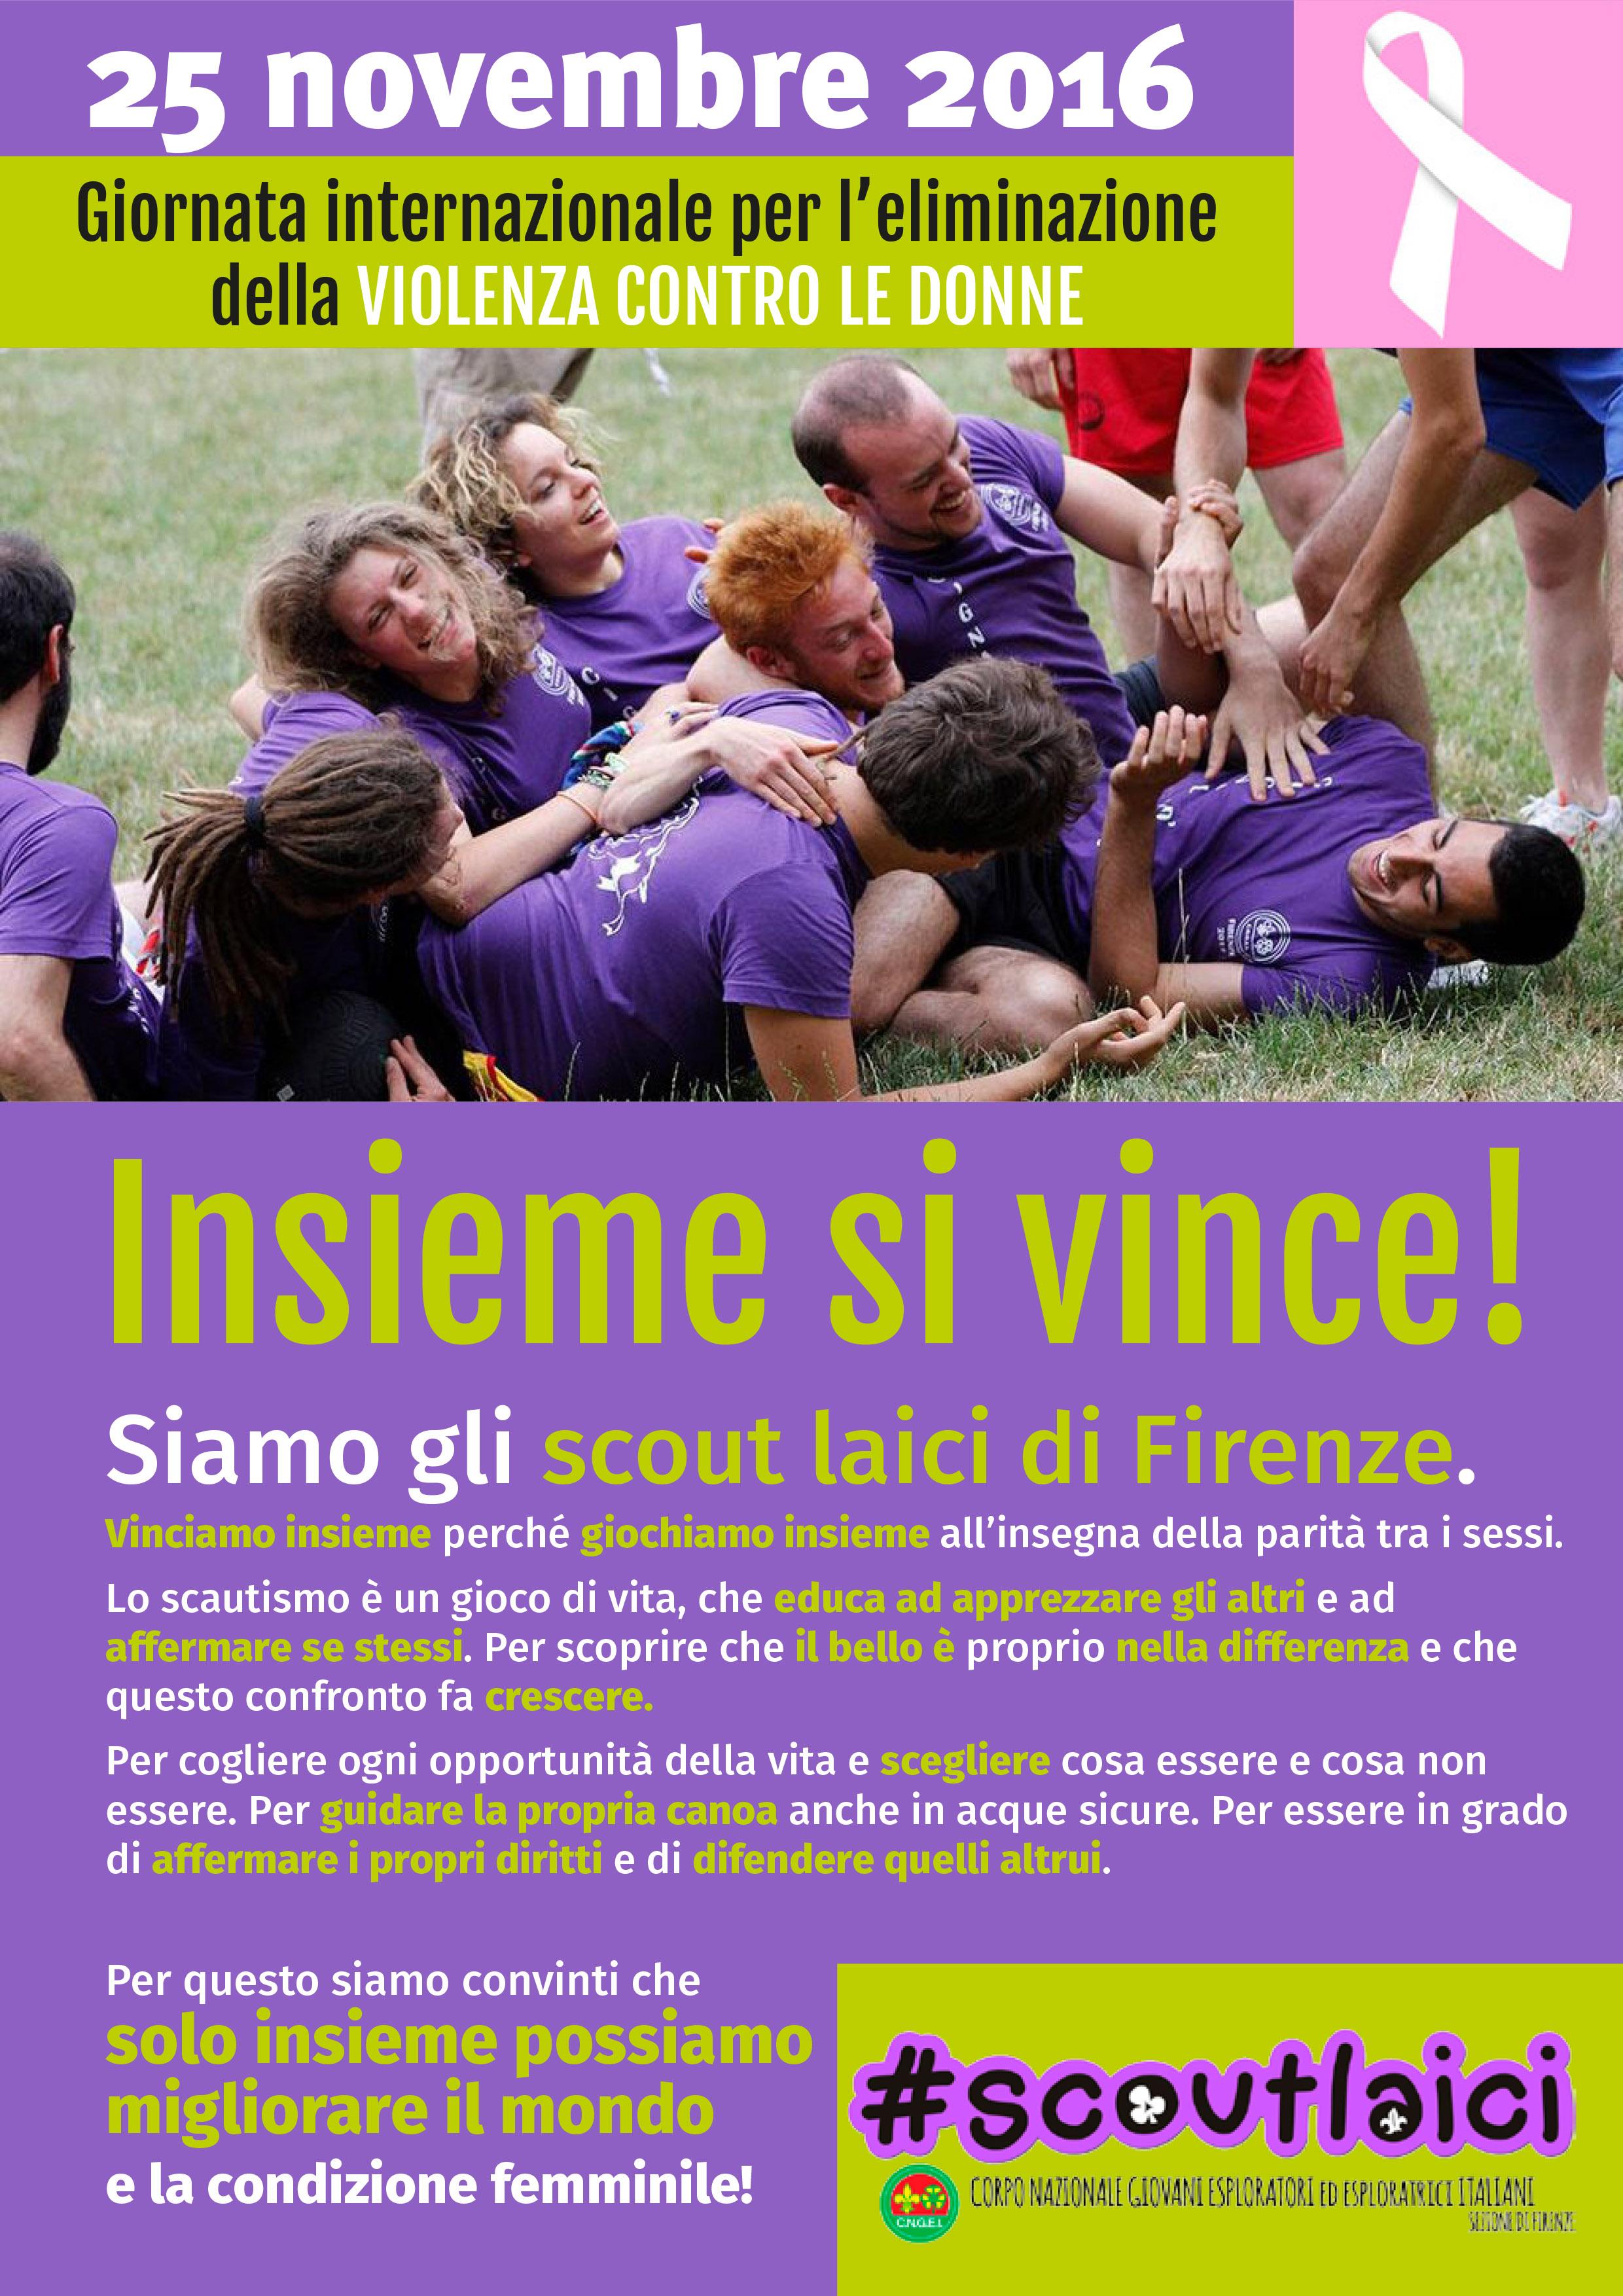 locandina_violenza_donne_scoutfirenze